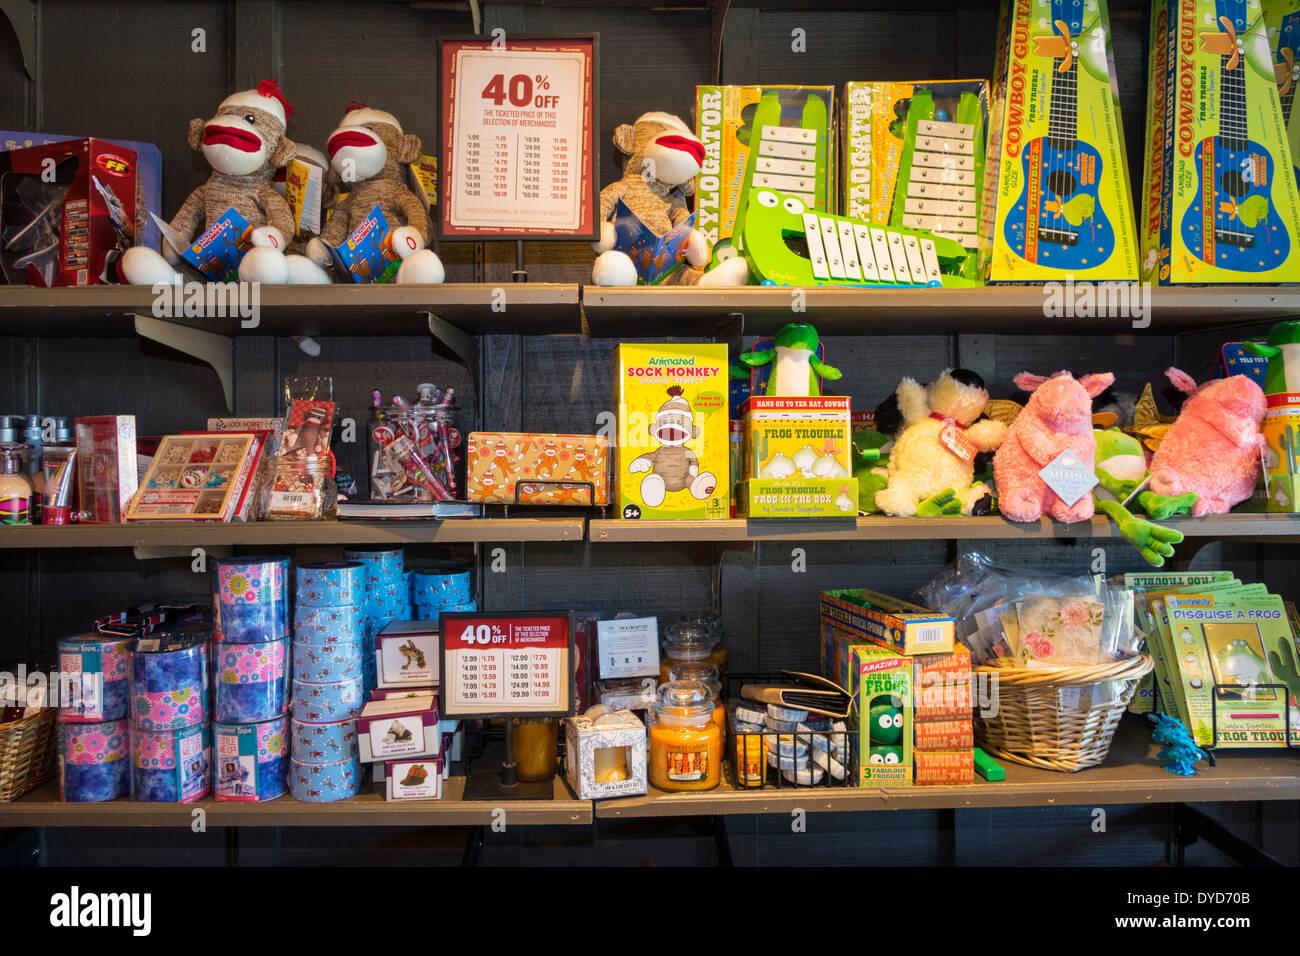 Cracker Barrel Toys : Vero beach florida cracker barrel restaurant gift shop